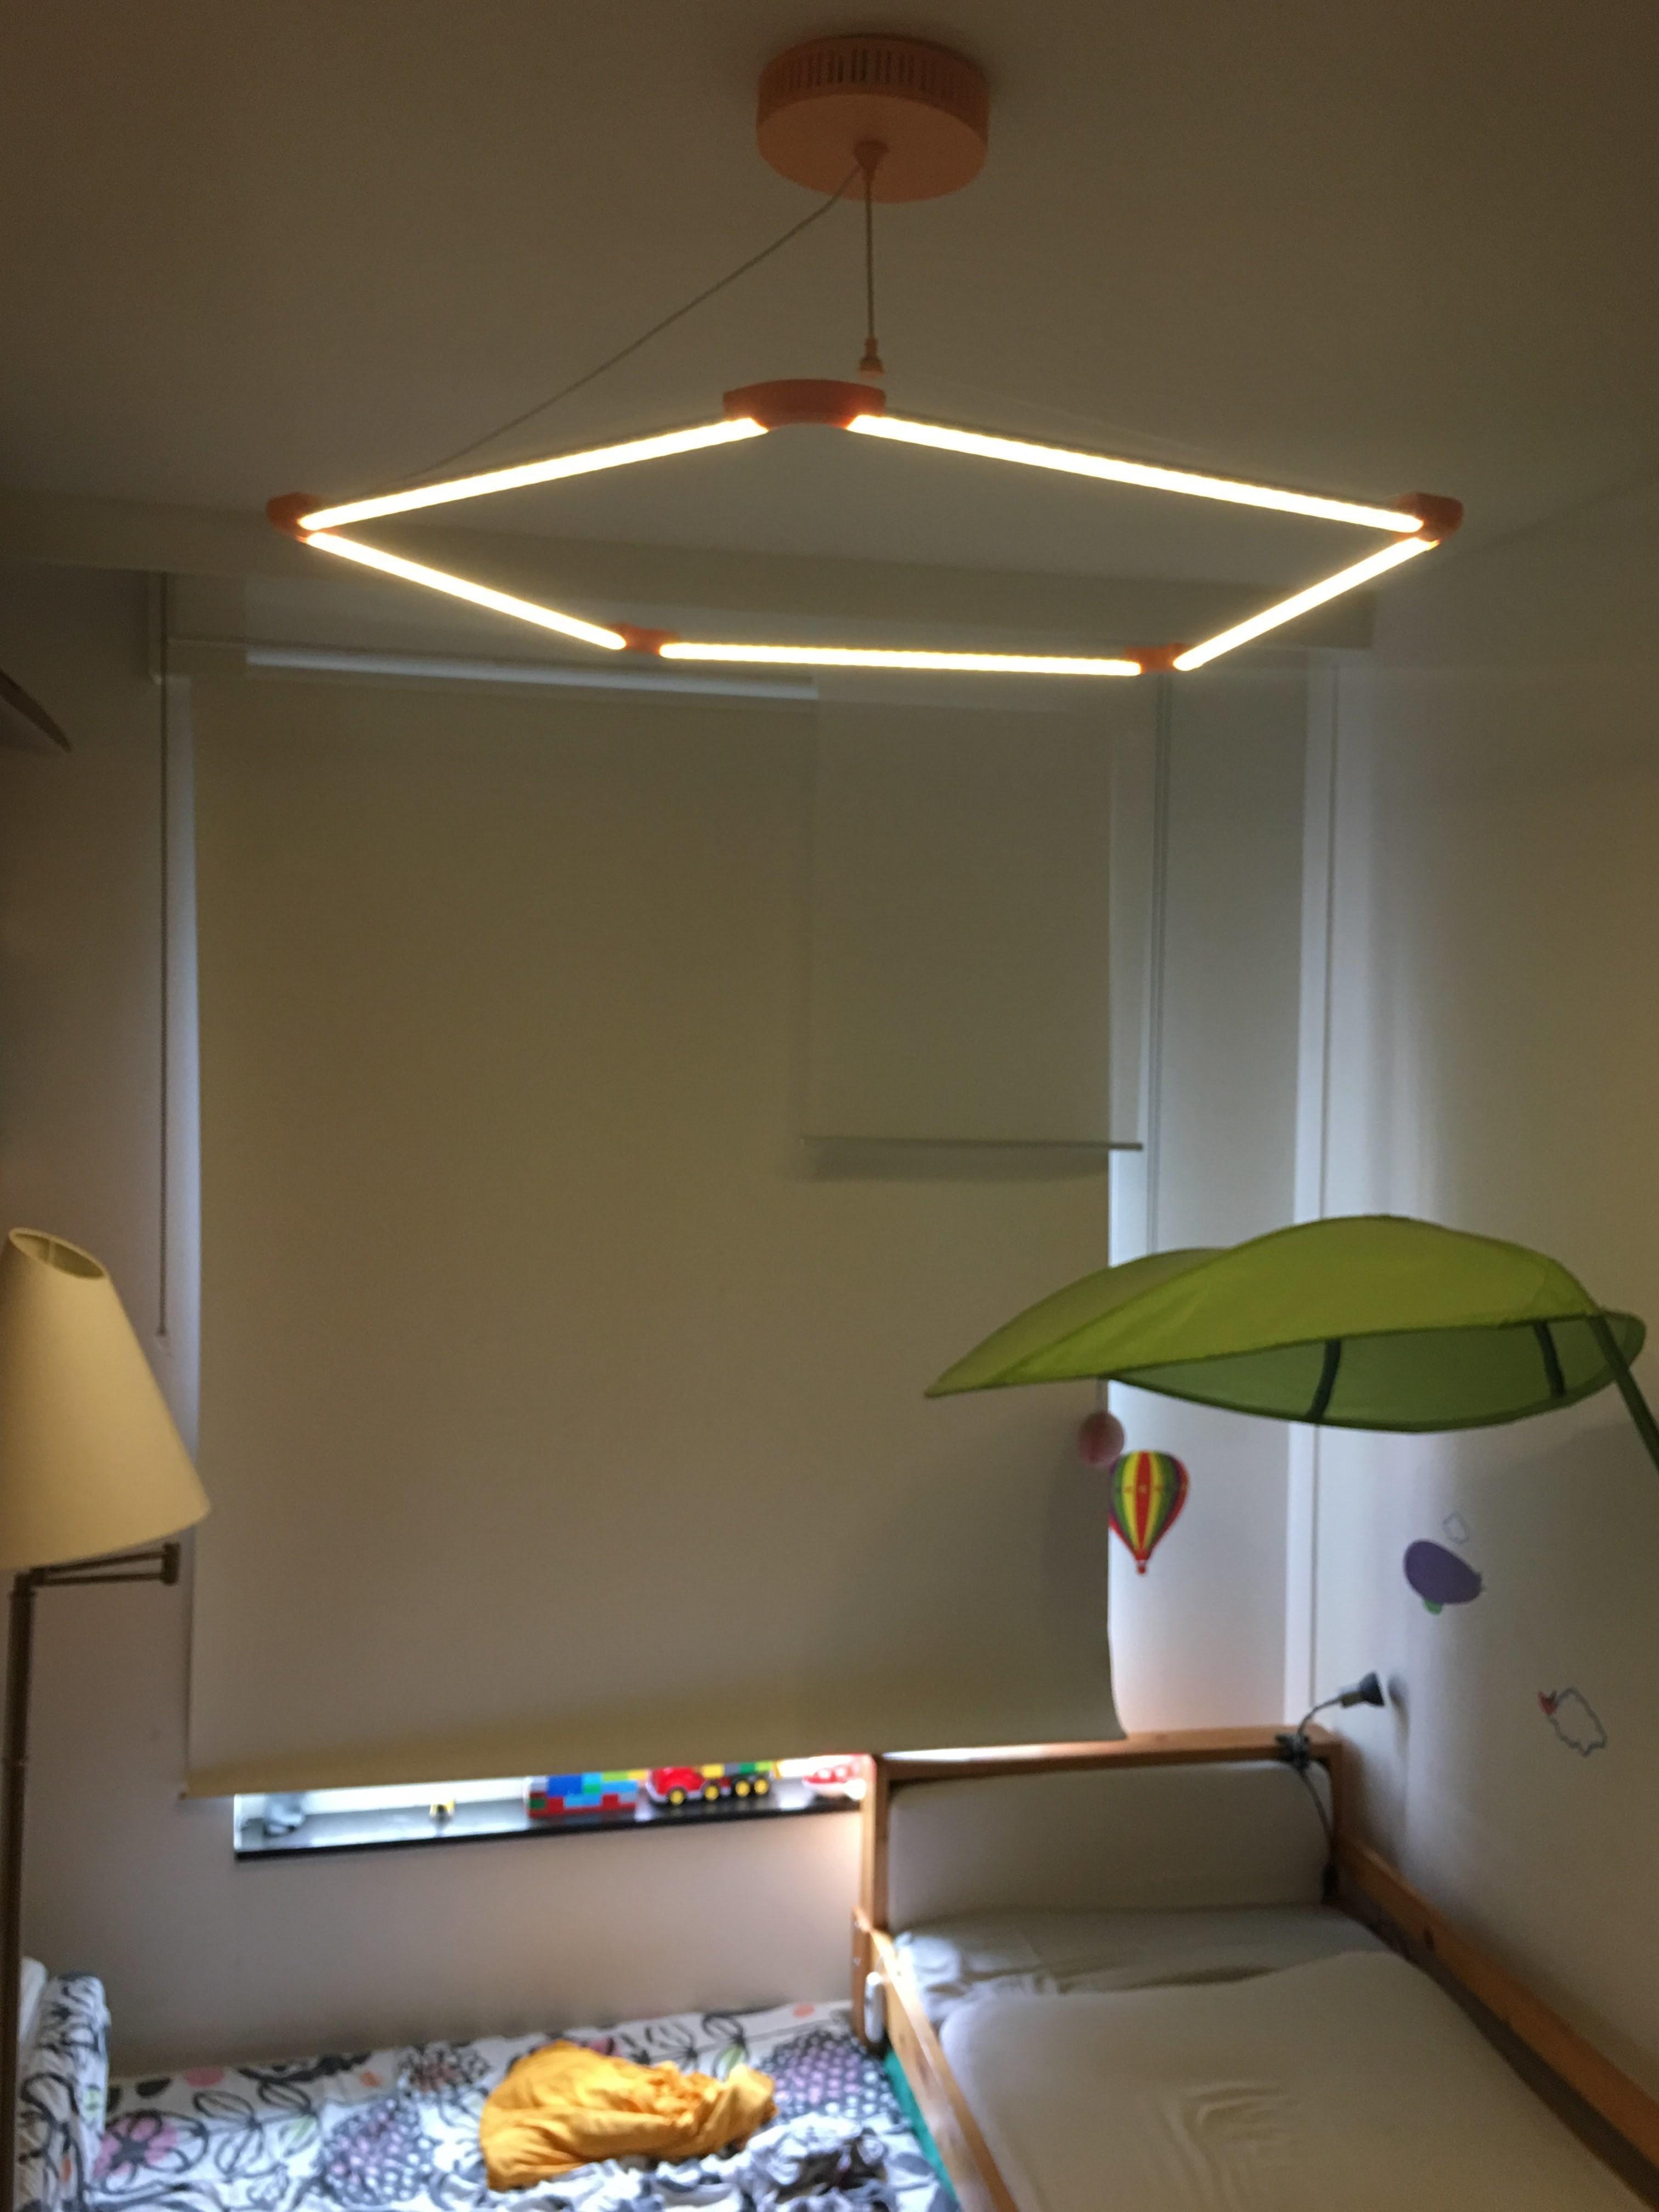 IMG_2970.jpg Download STL file LED ceiling light • Model to 3D print, tomcasa